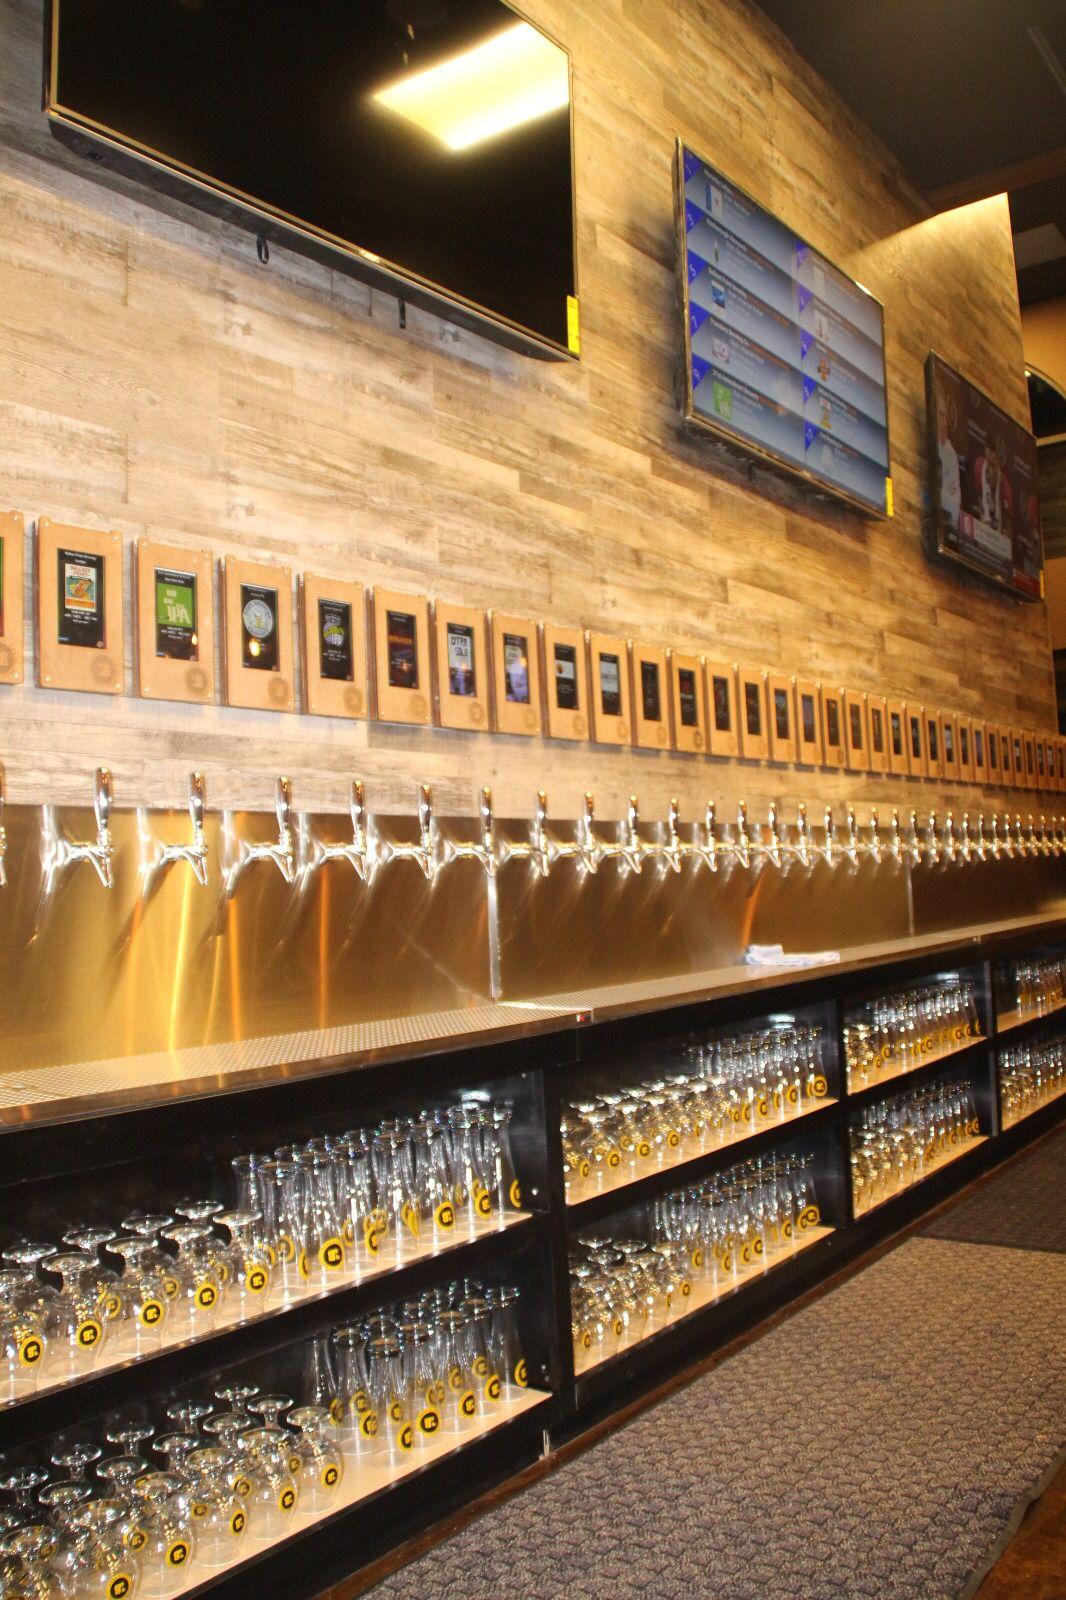 Thirsty Bay Tap N Pour Beer Bar Ideas Beer Bar Design Beer Bar